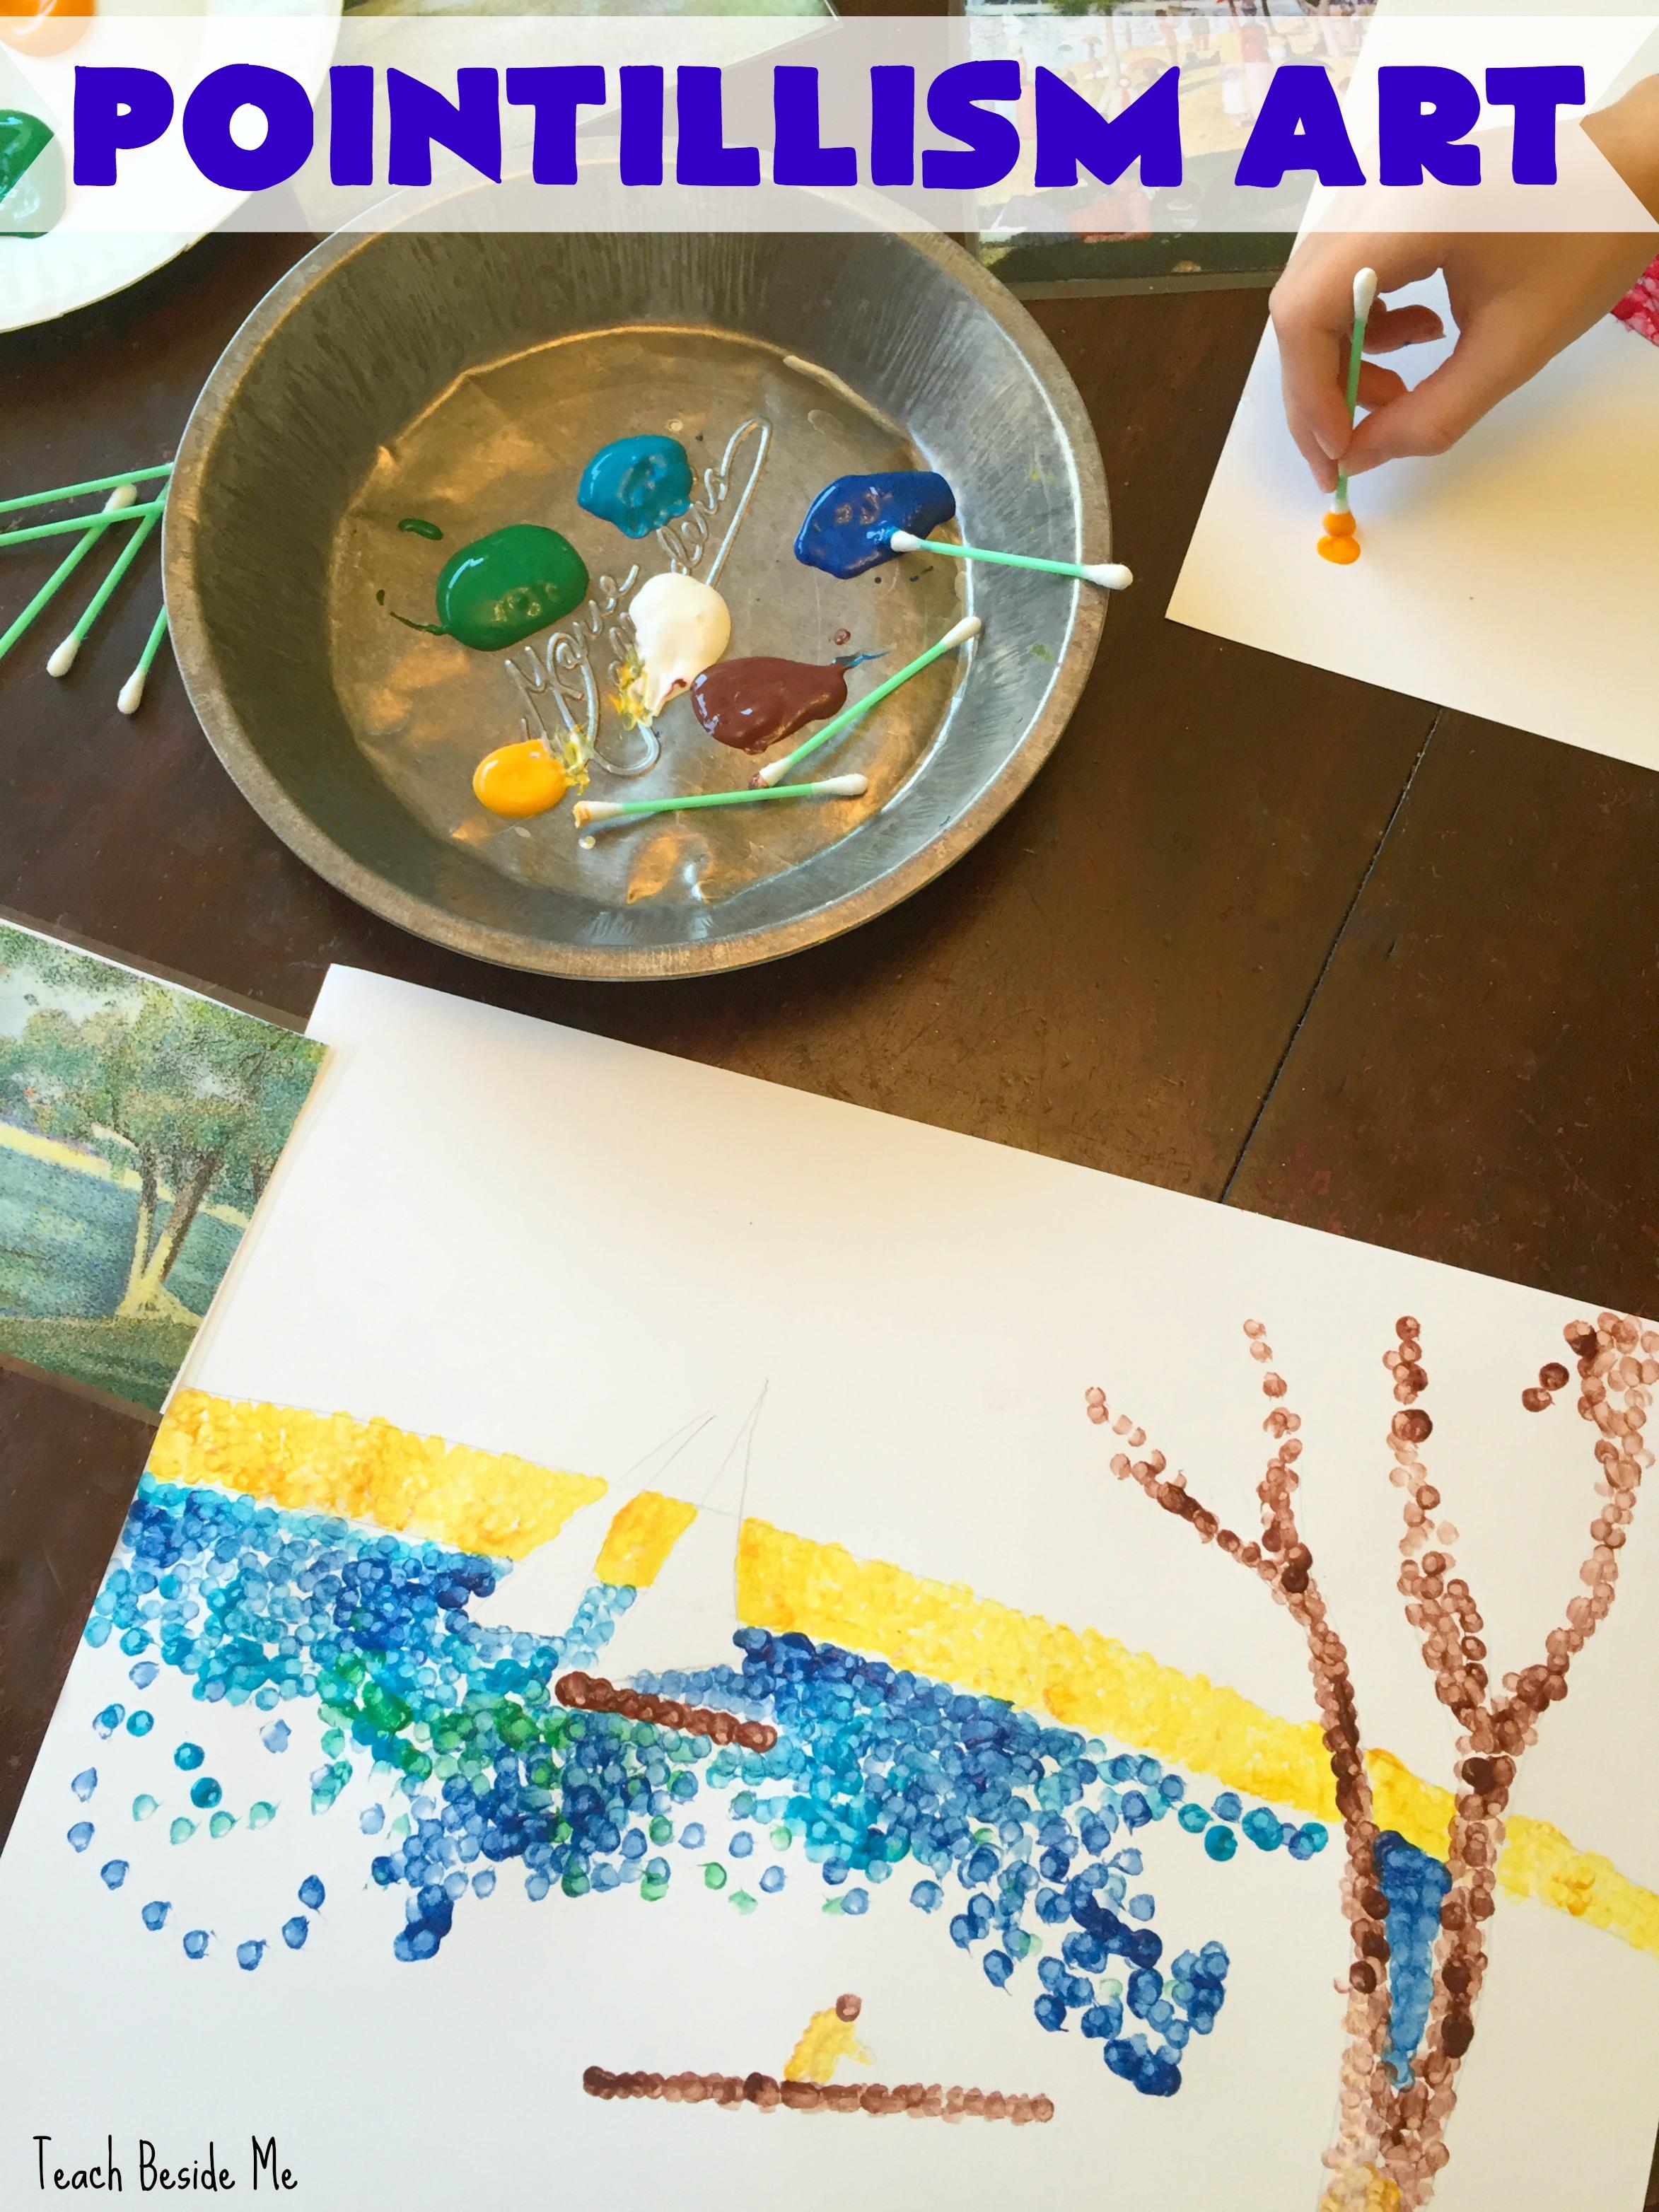 Pointillism Art with Seurat